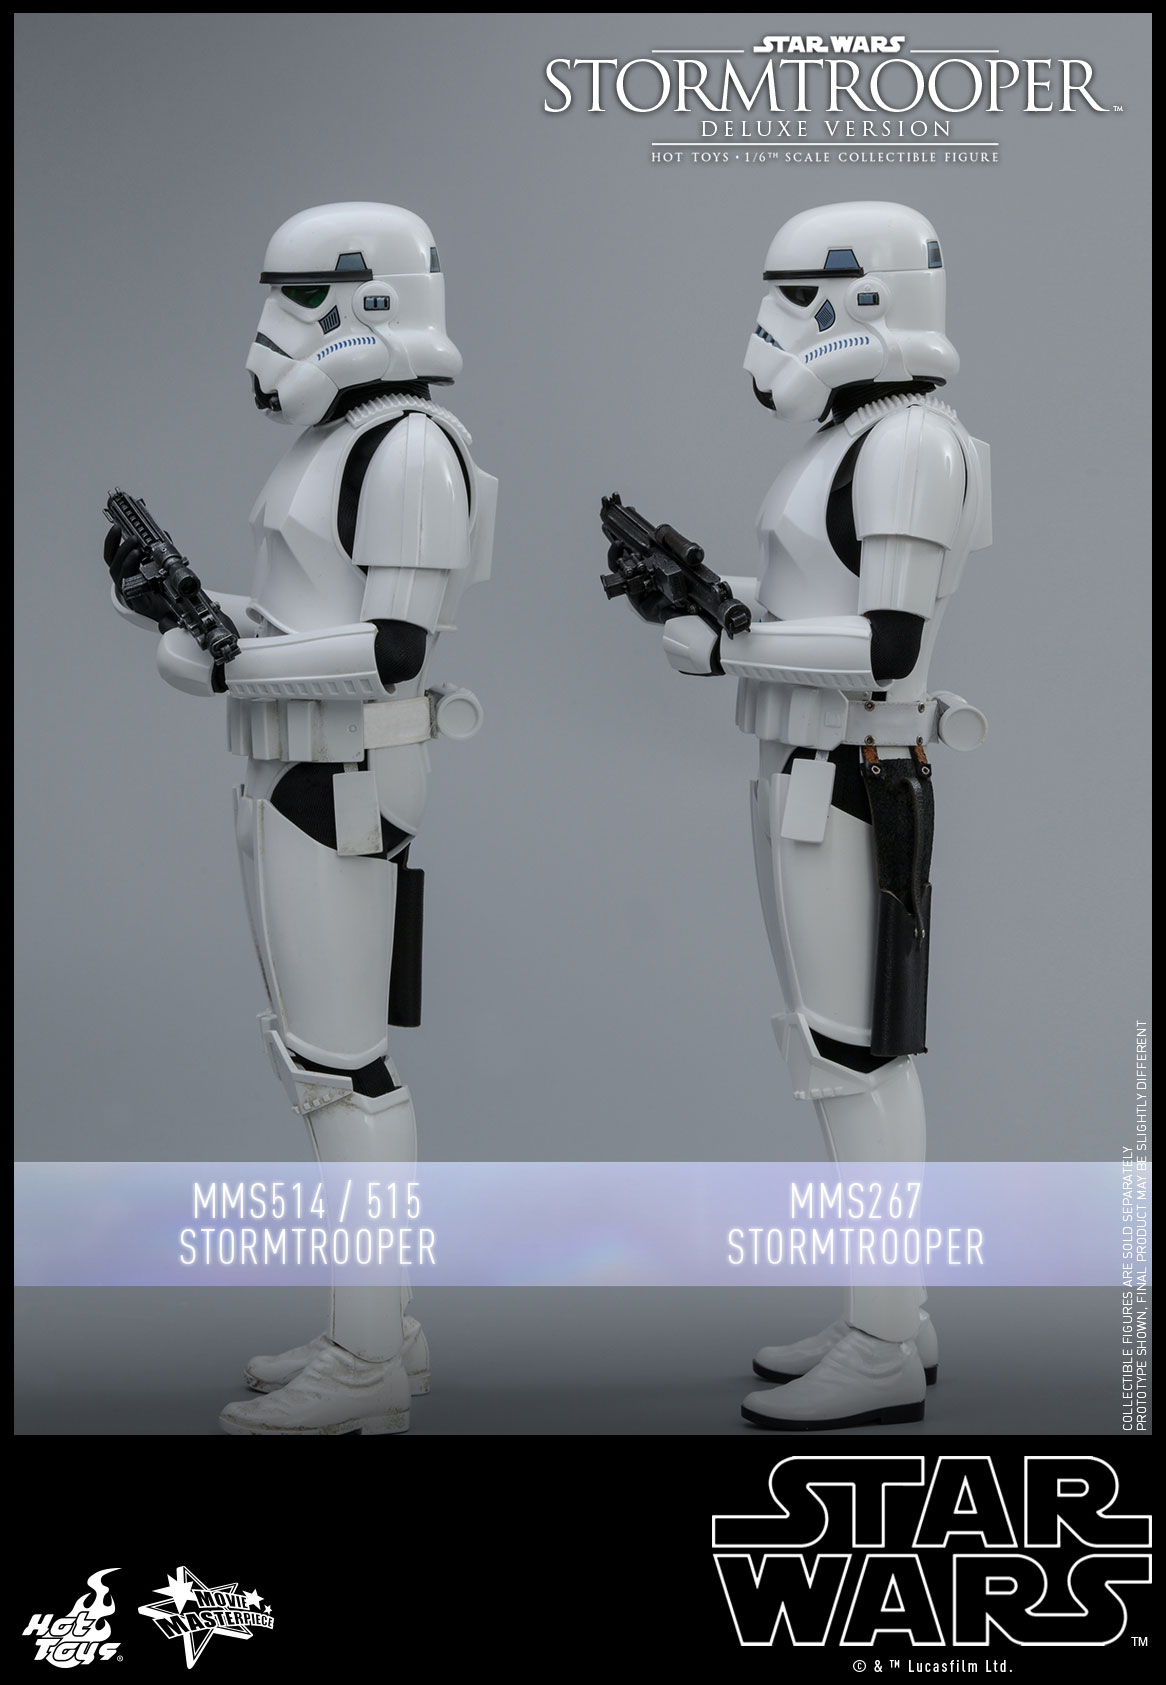 Hot-Toys---Star-Wars---Stormtrooper-Collectible-Figure-(Deluxe-Version)_PR7